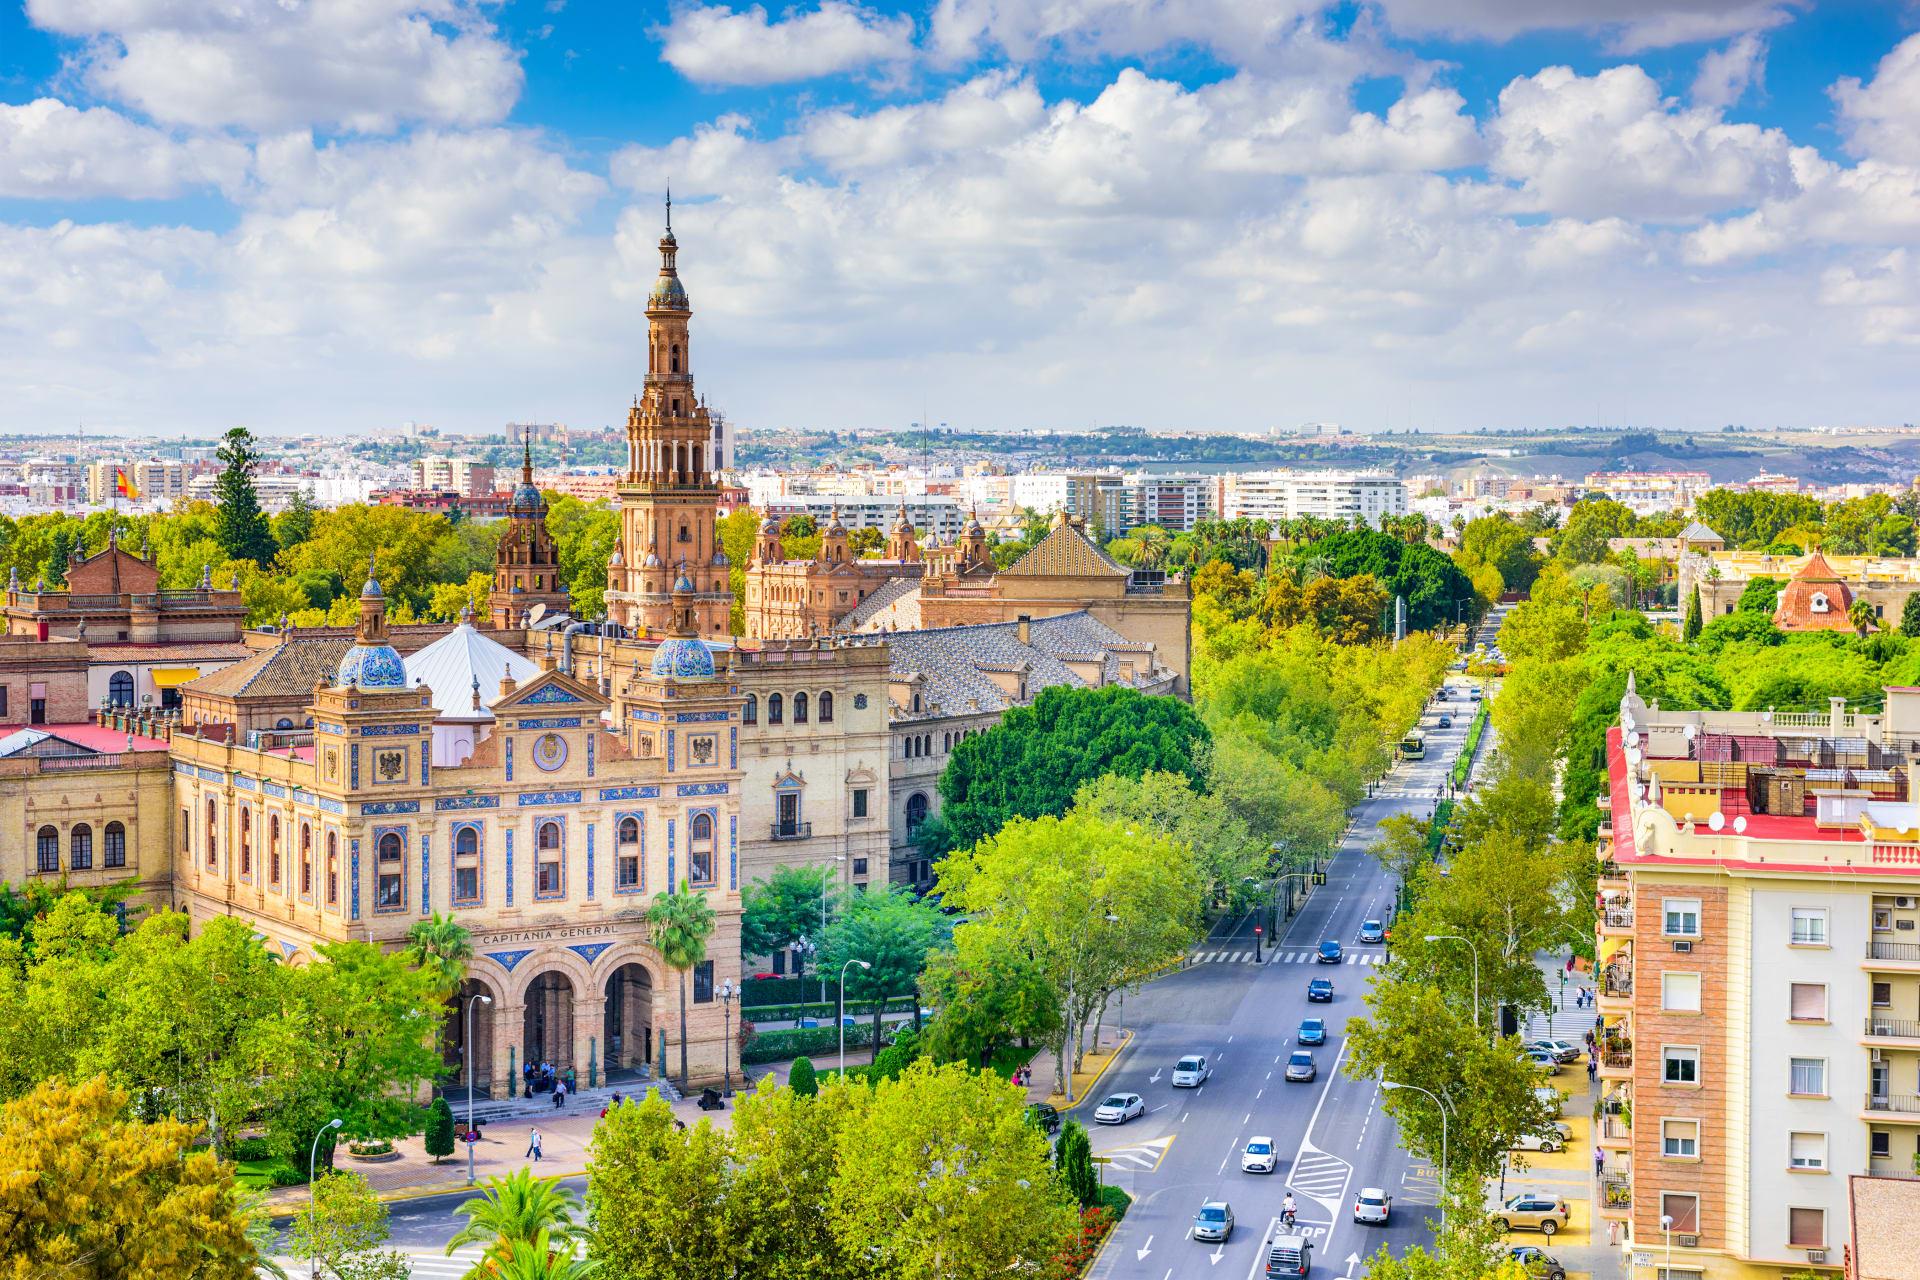 Seville - The Seville of Cervantes